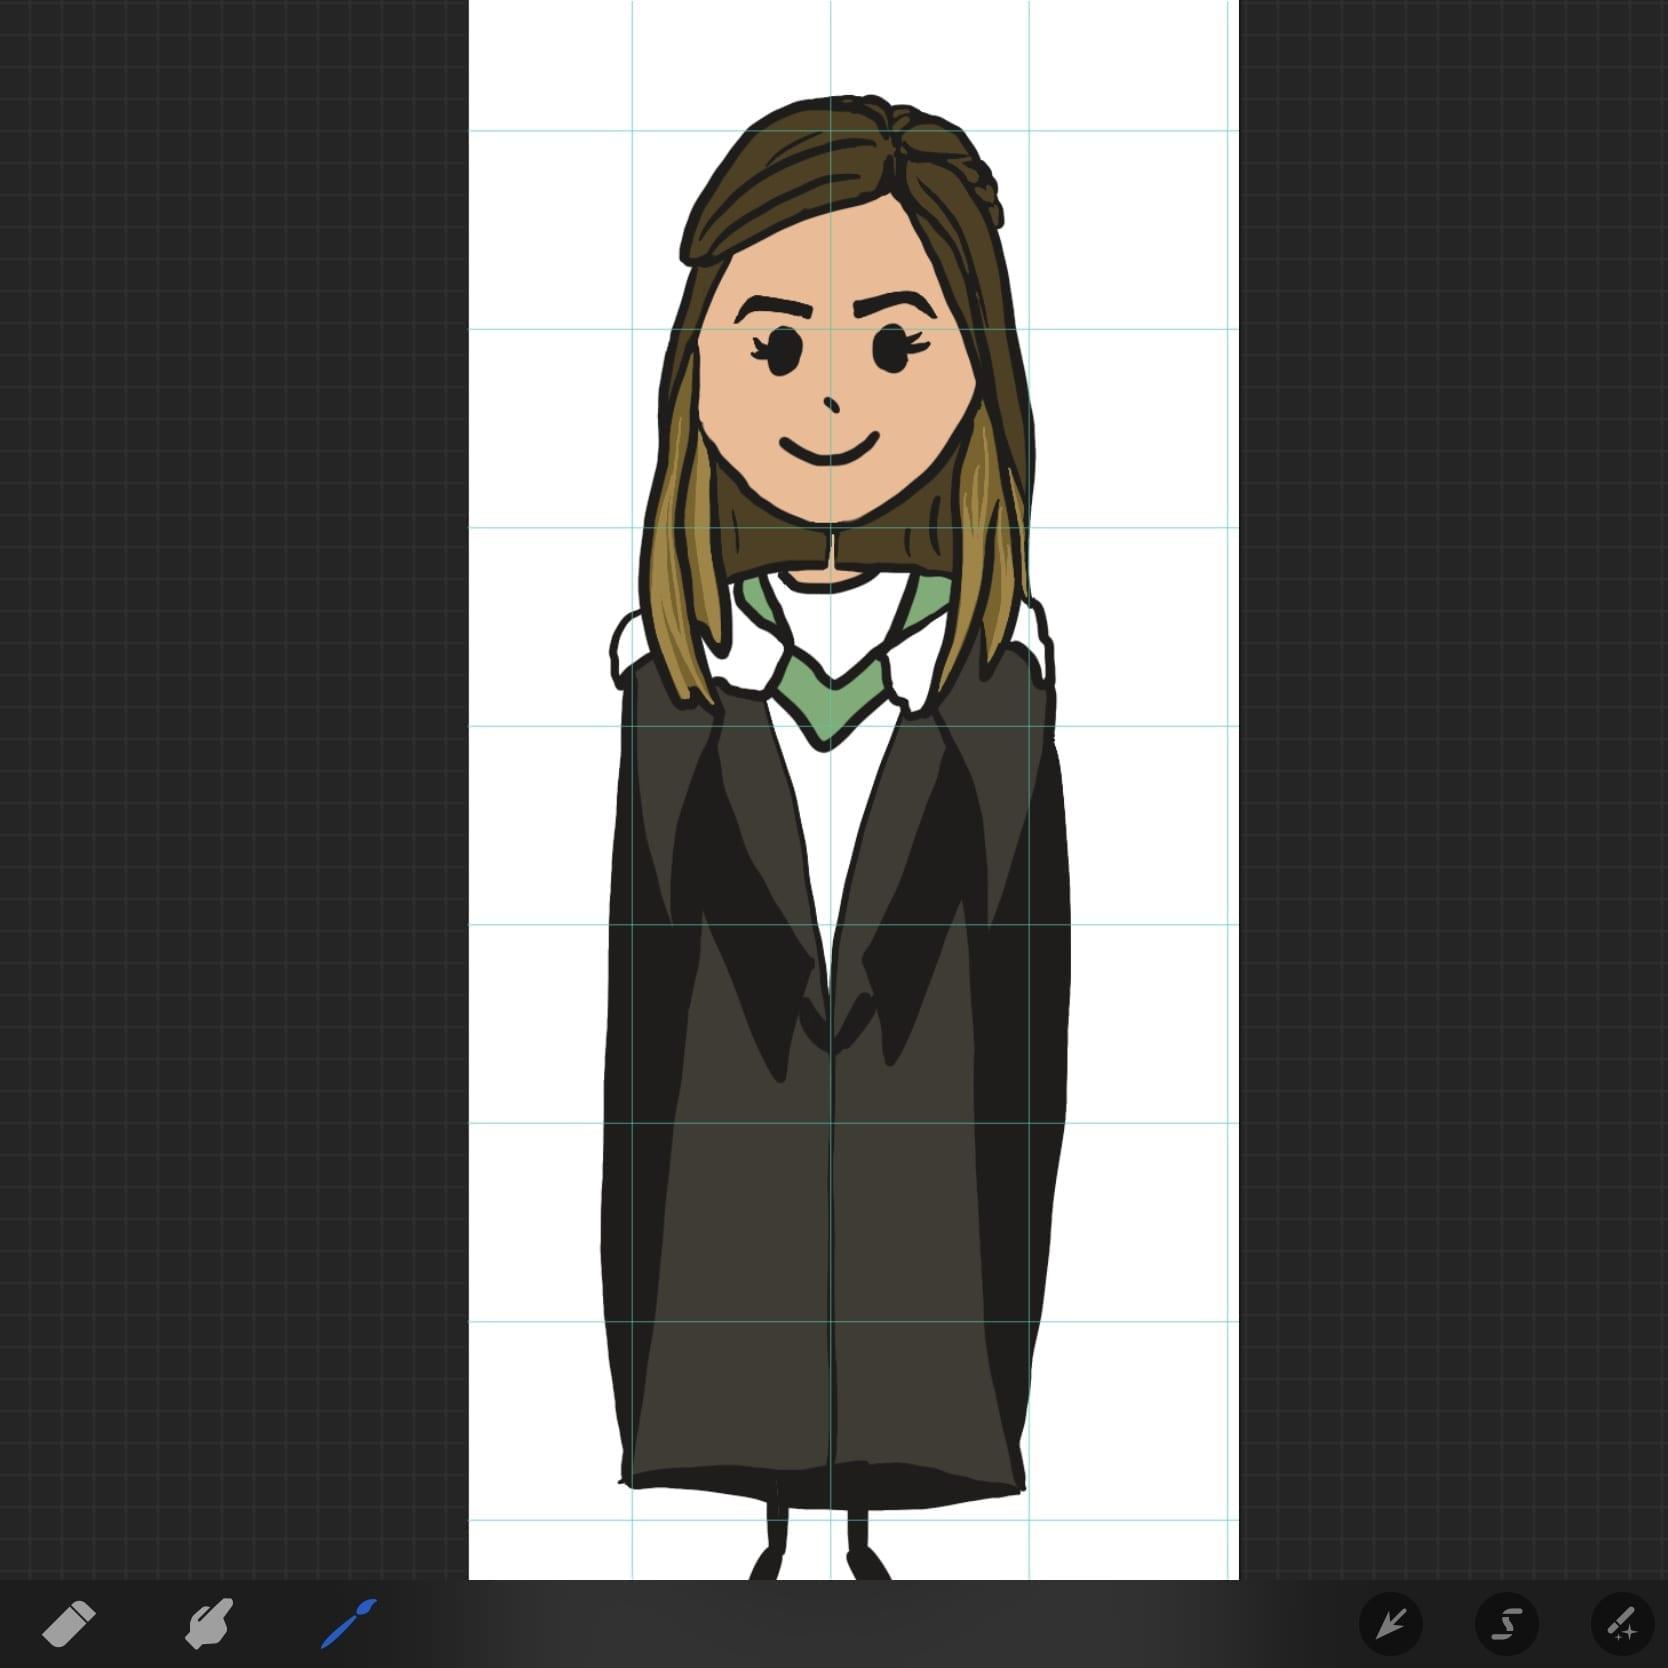 Designing greeting cards - custom cartoon portrait